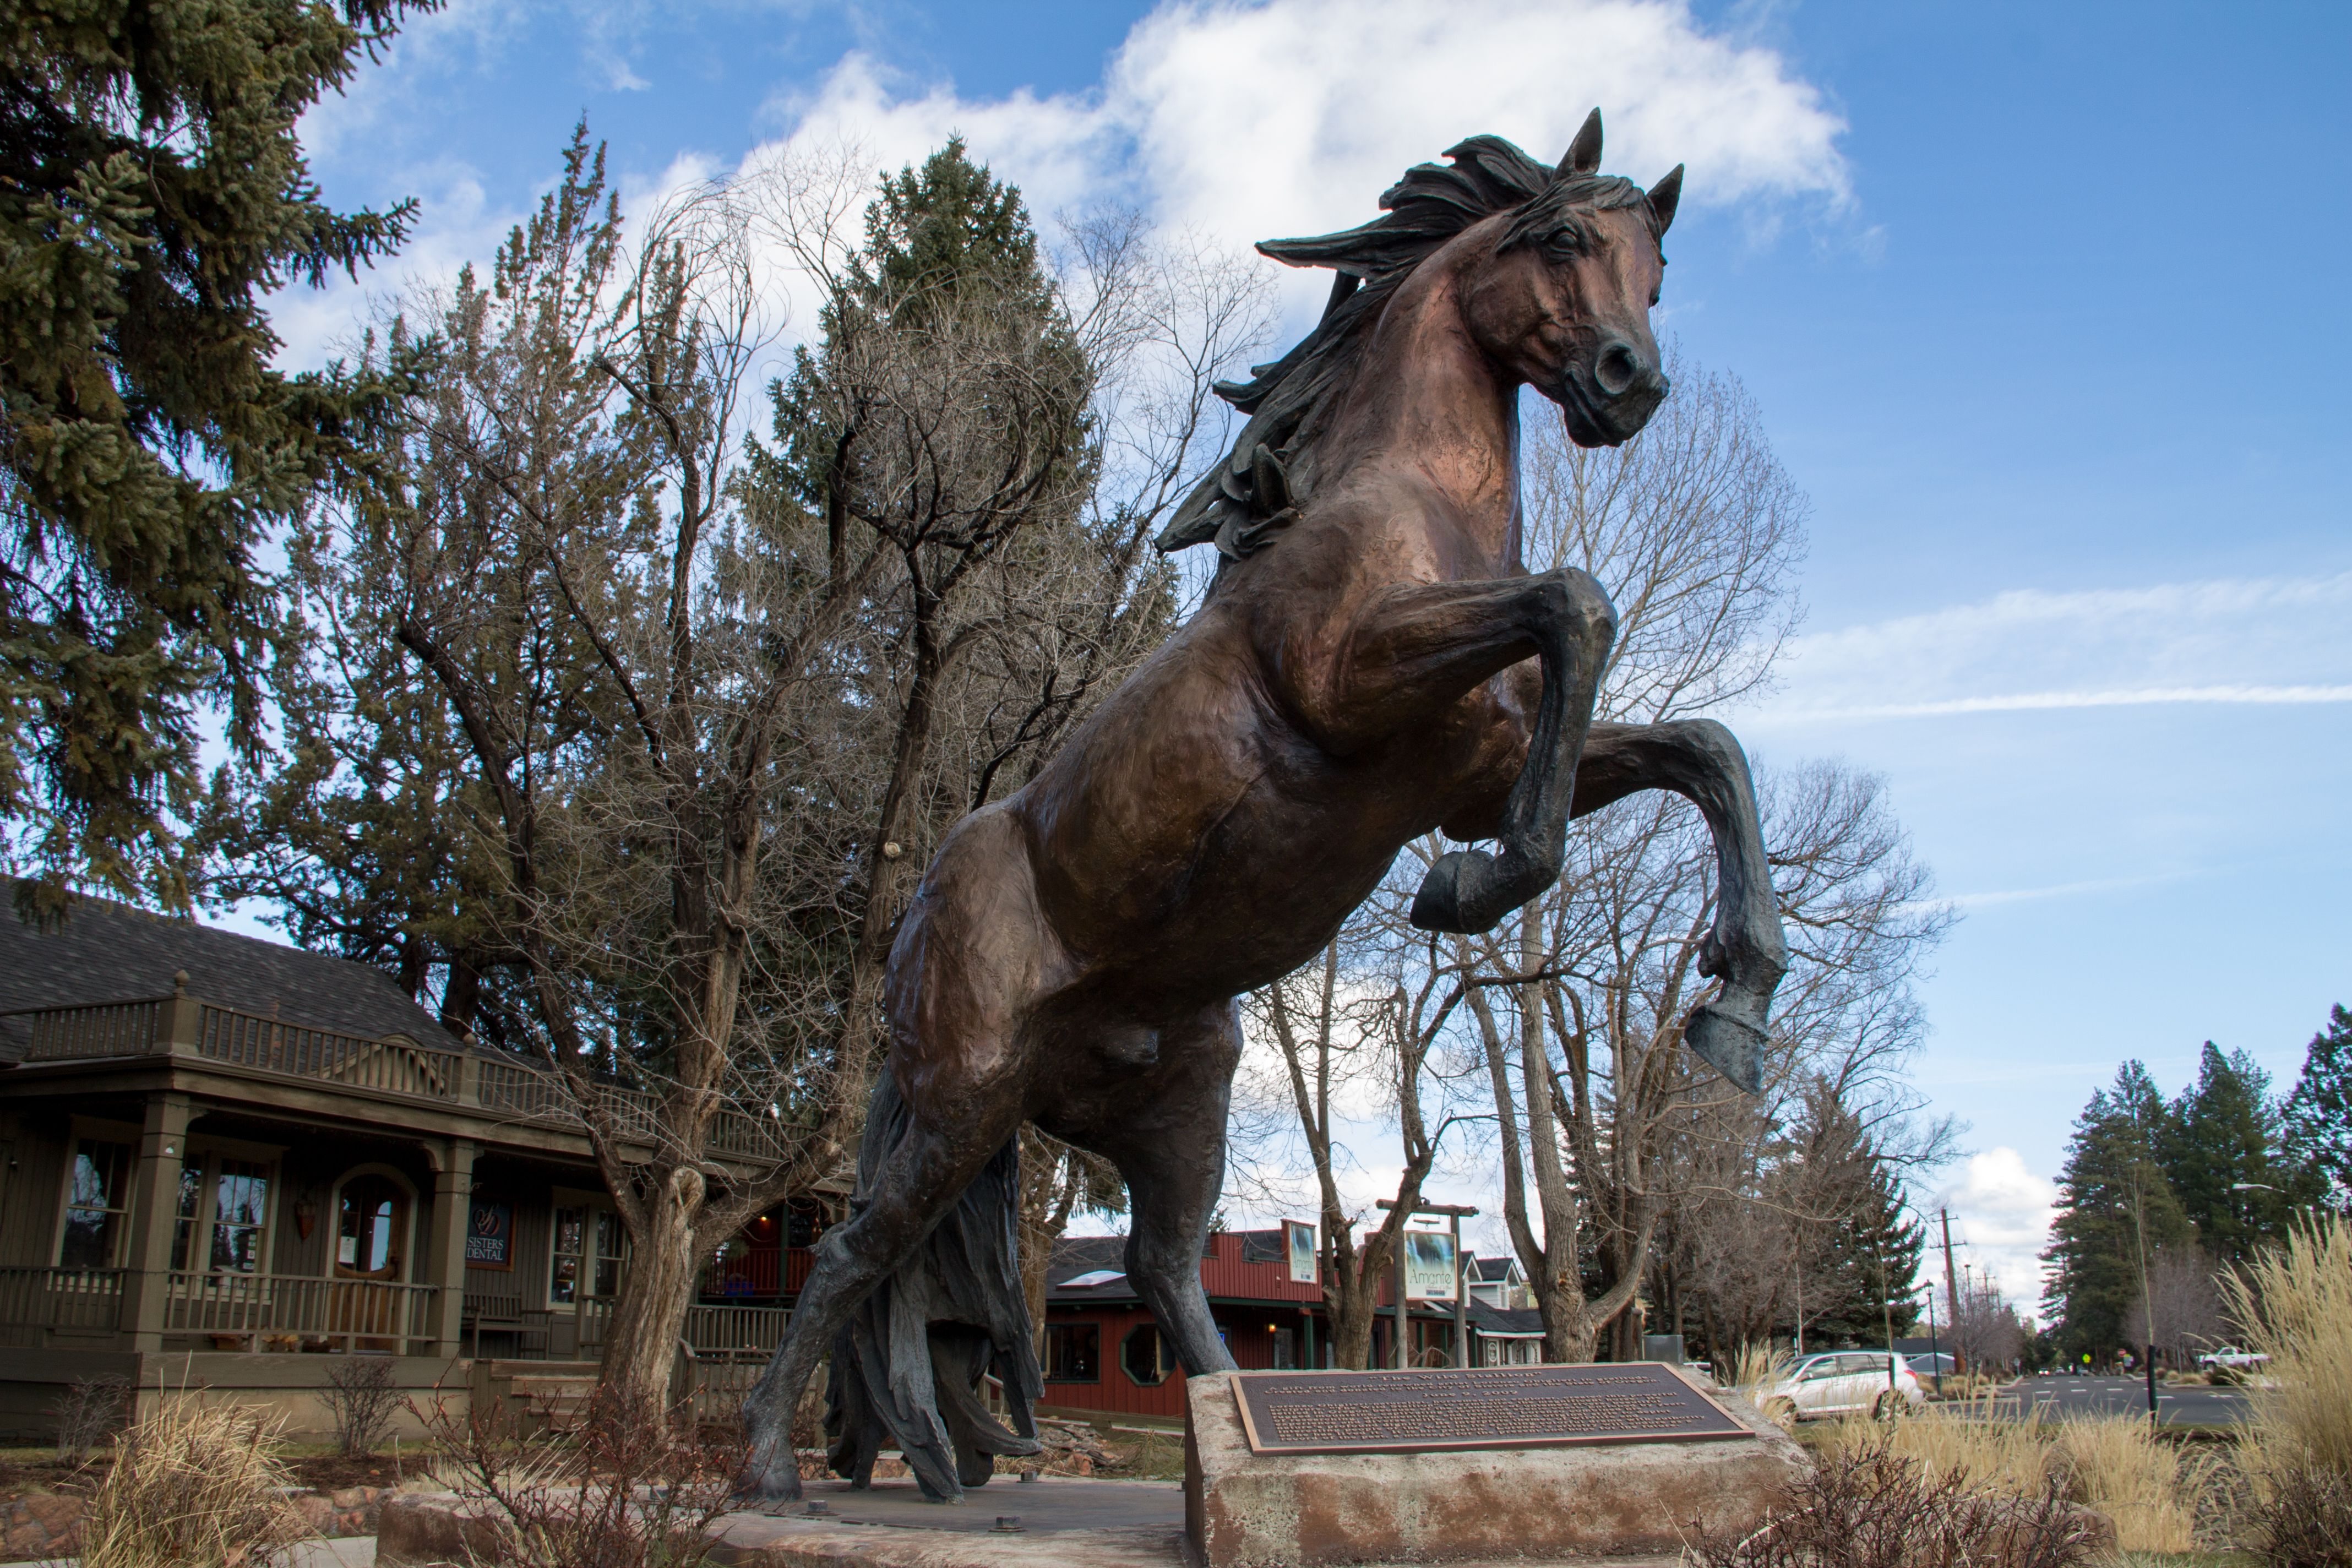 horse sculpture 2 (1 of 1)